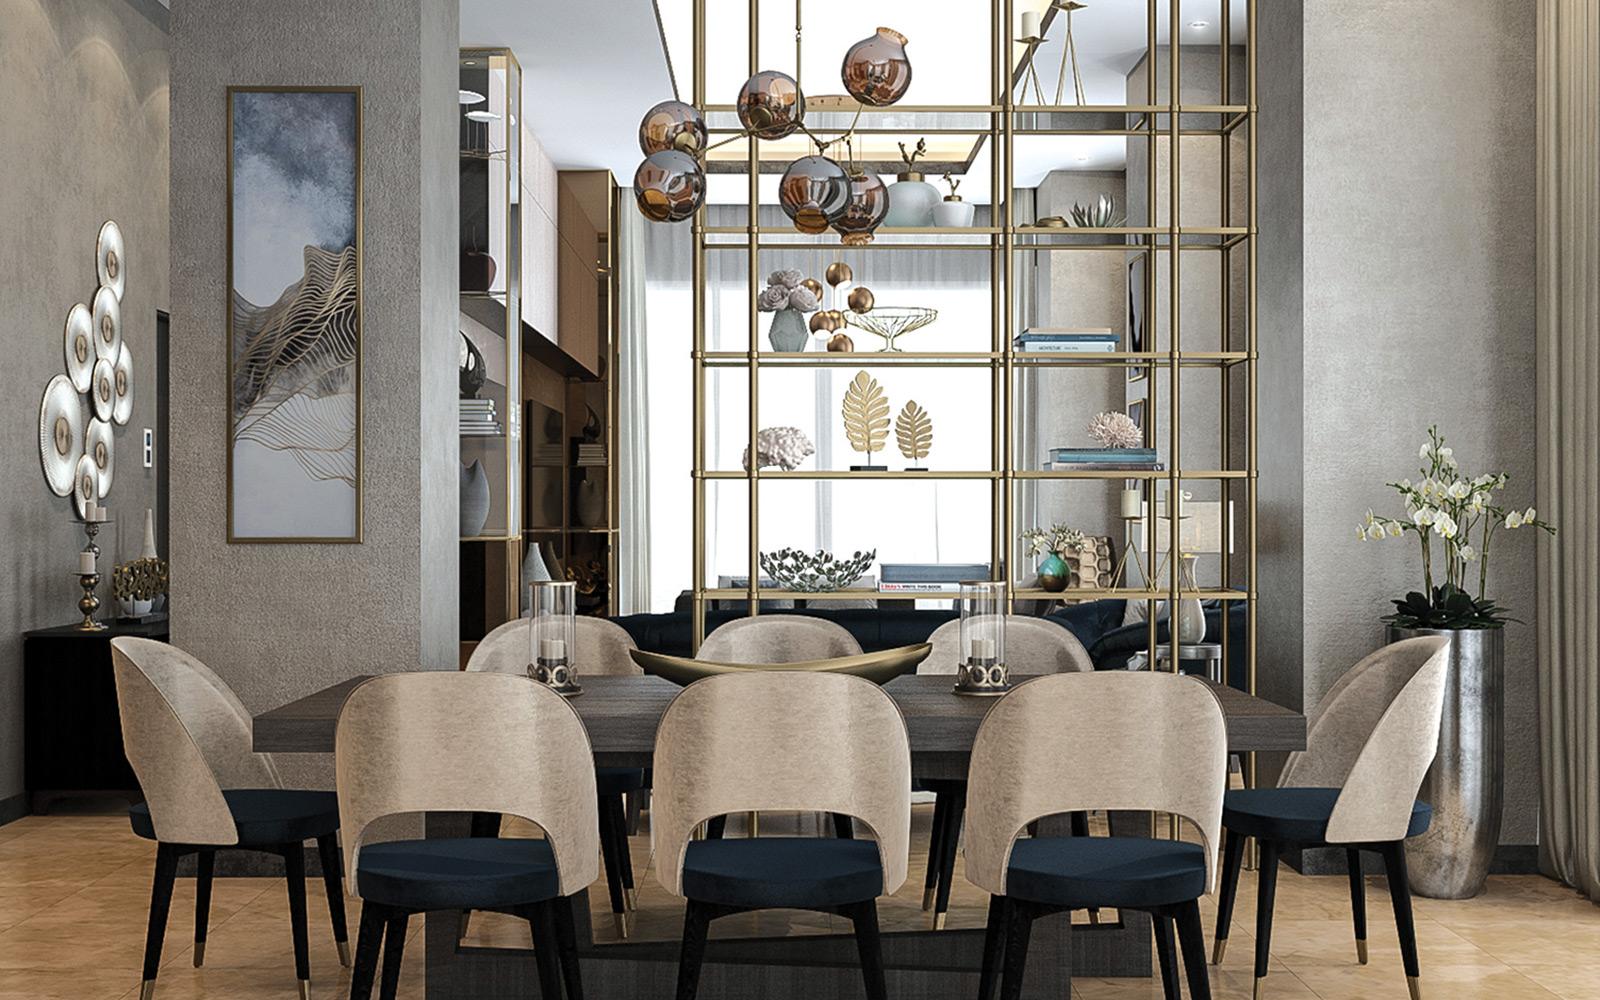 Vogue Design - Istanbul Basaksehir Flat7